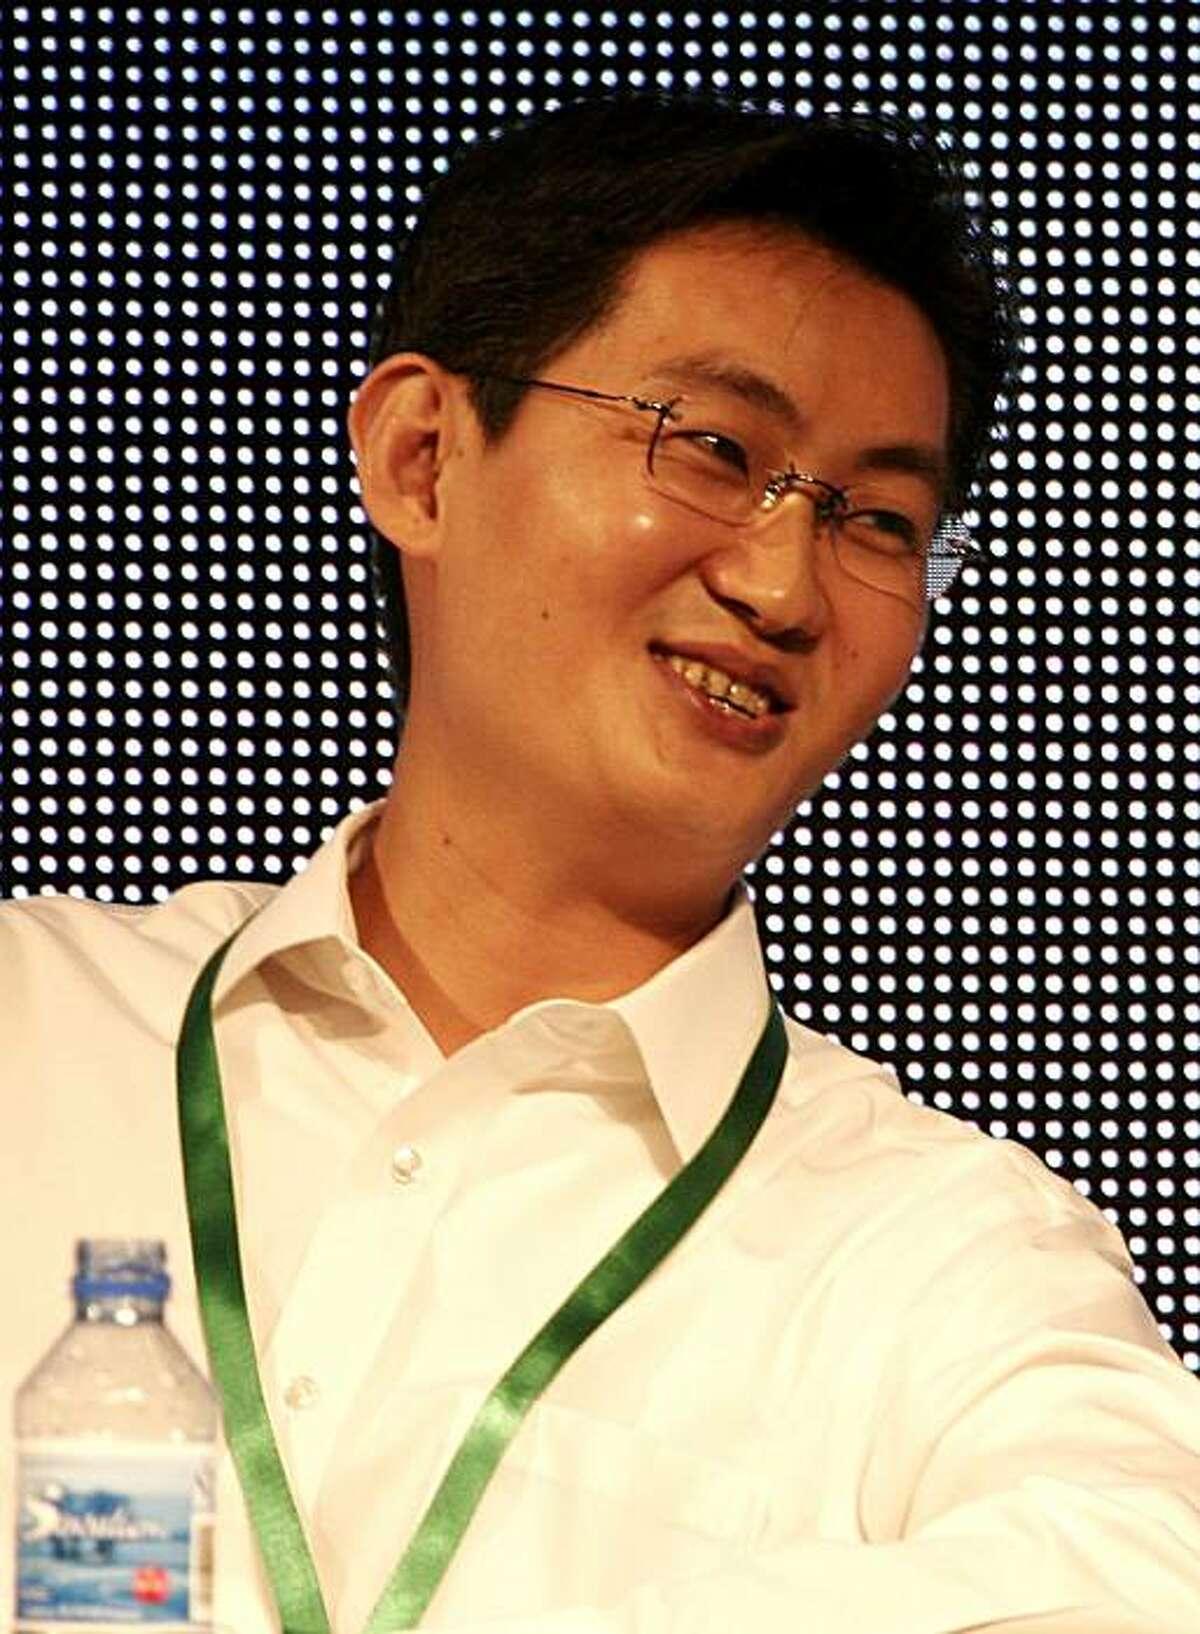 48. Ma Huateng Tencent chief executive